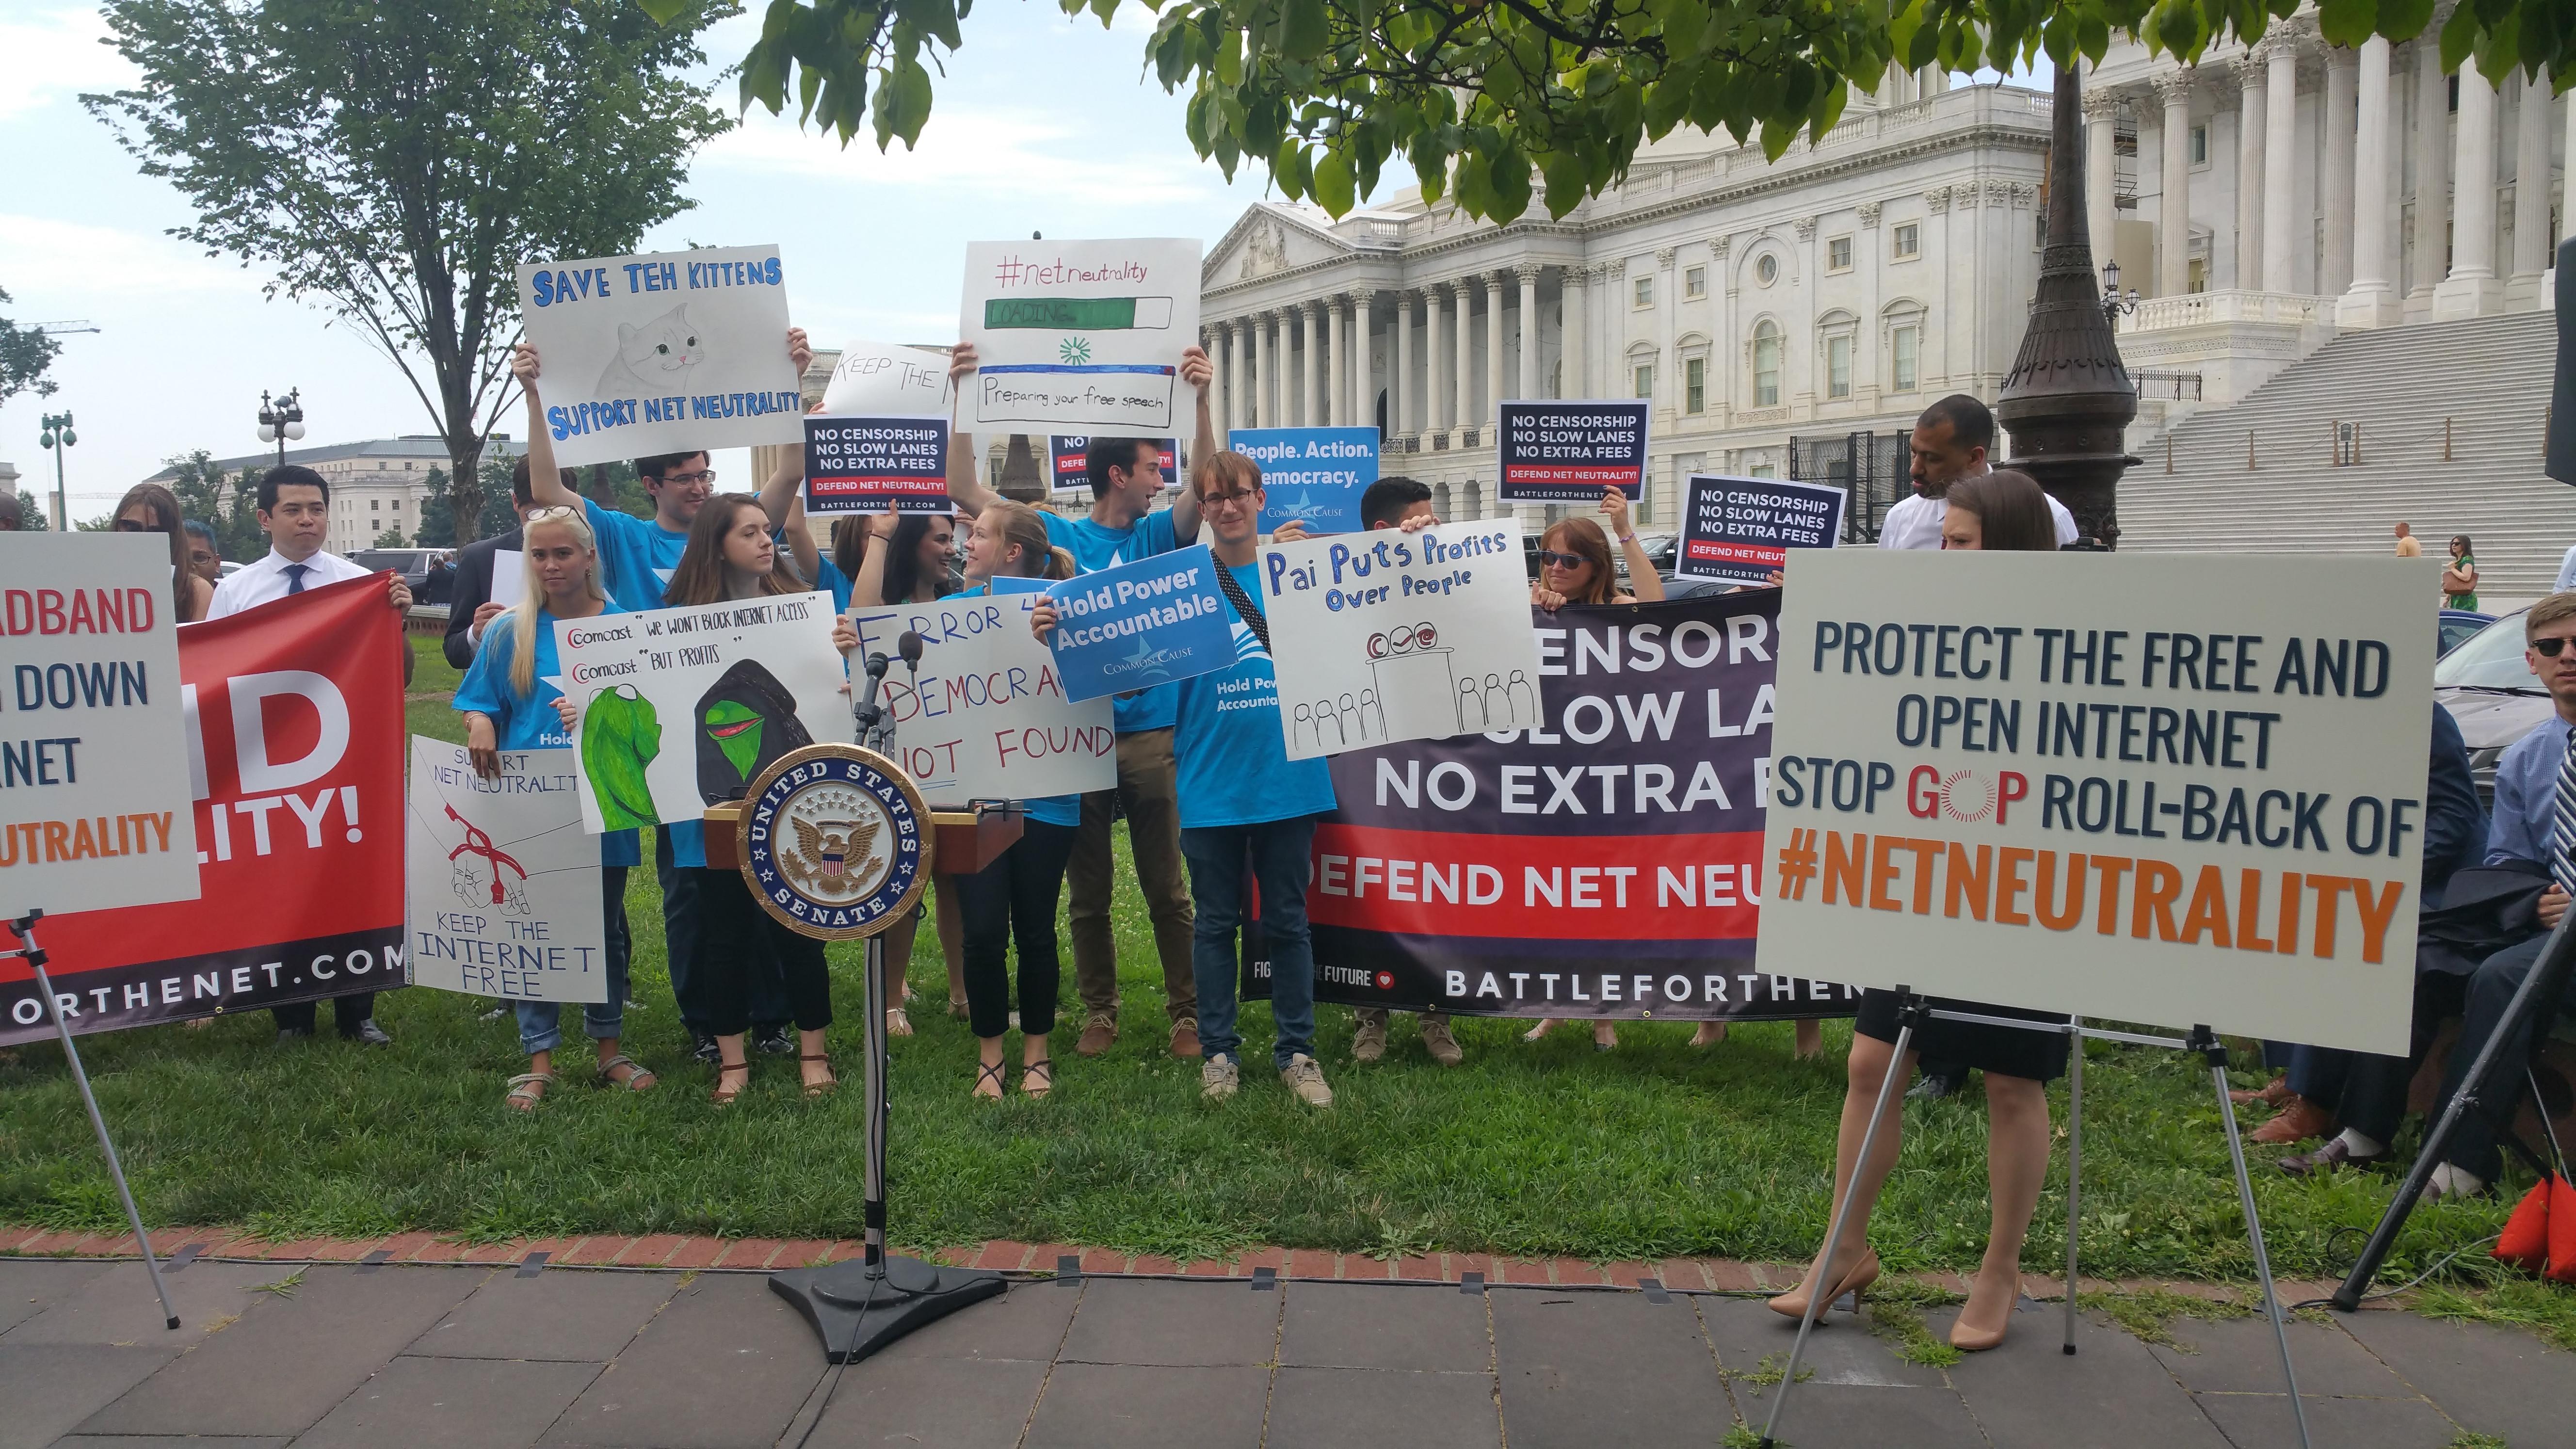 The FCC's craven net neutrality vote announcement makes no mention of the 22 million comments filed